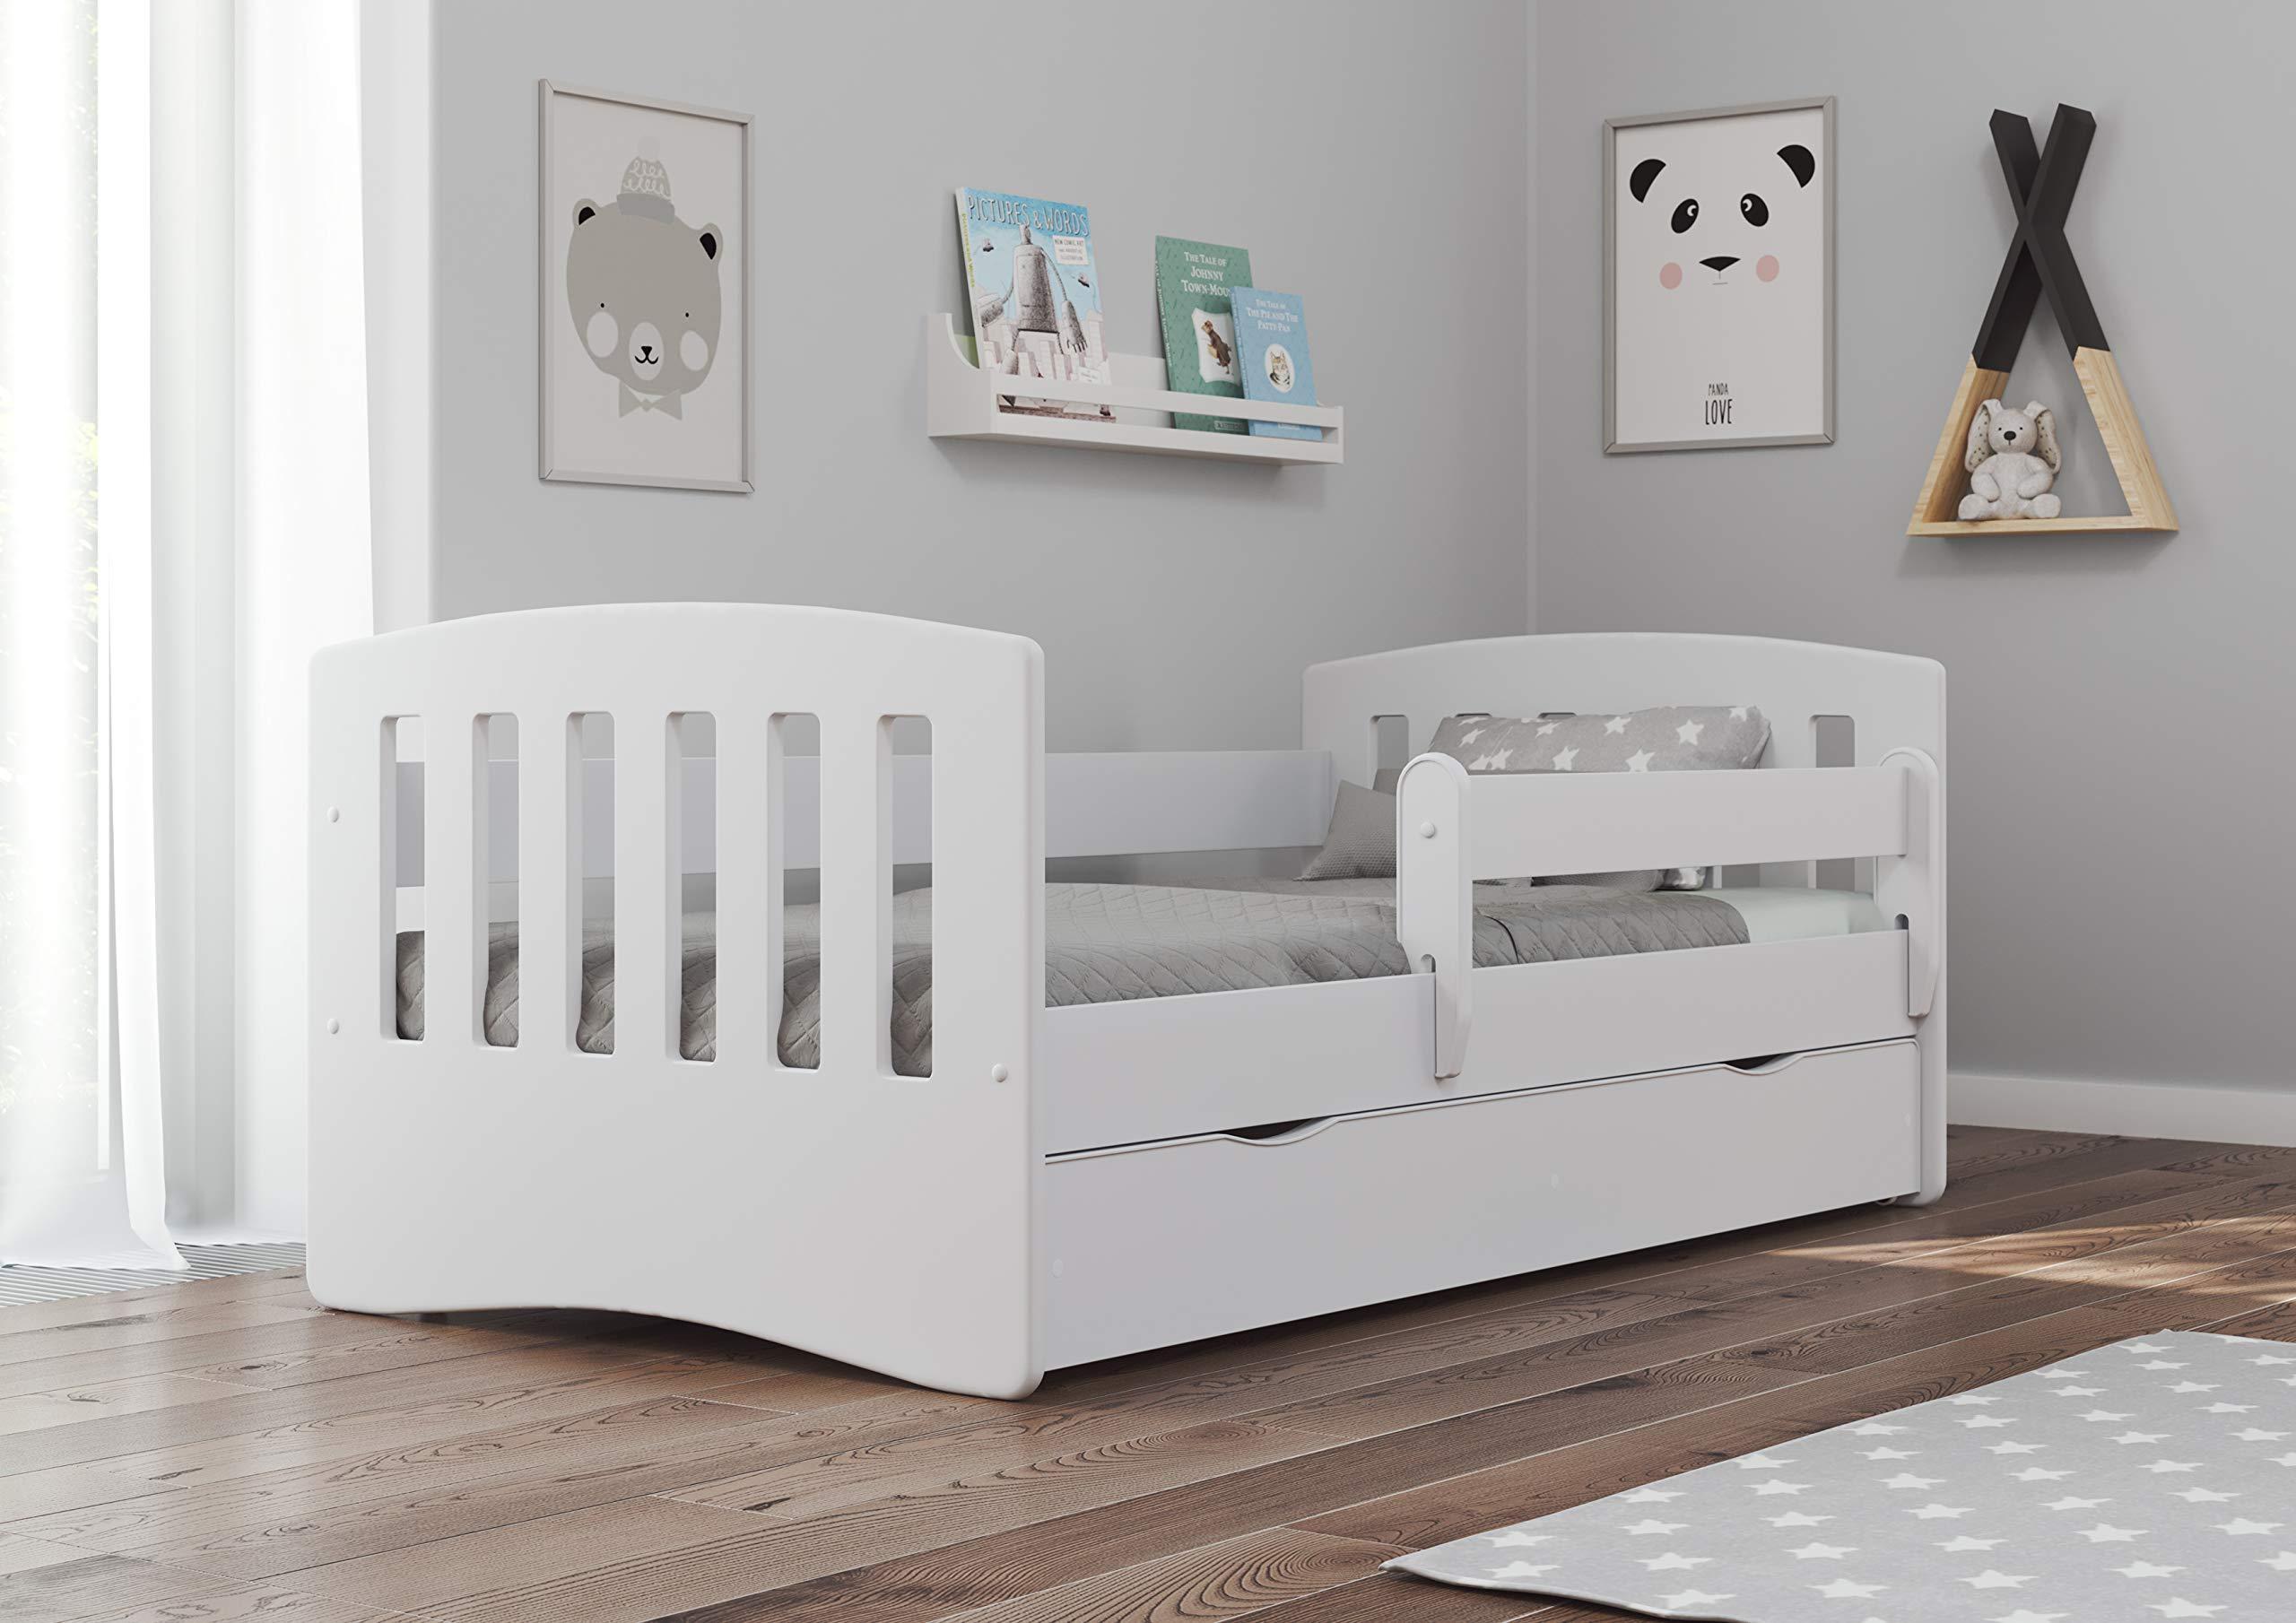 Toddler S Bed 140x80 160x80 180x80 Kids Buy Online In Kenya At Desertcart